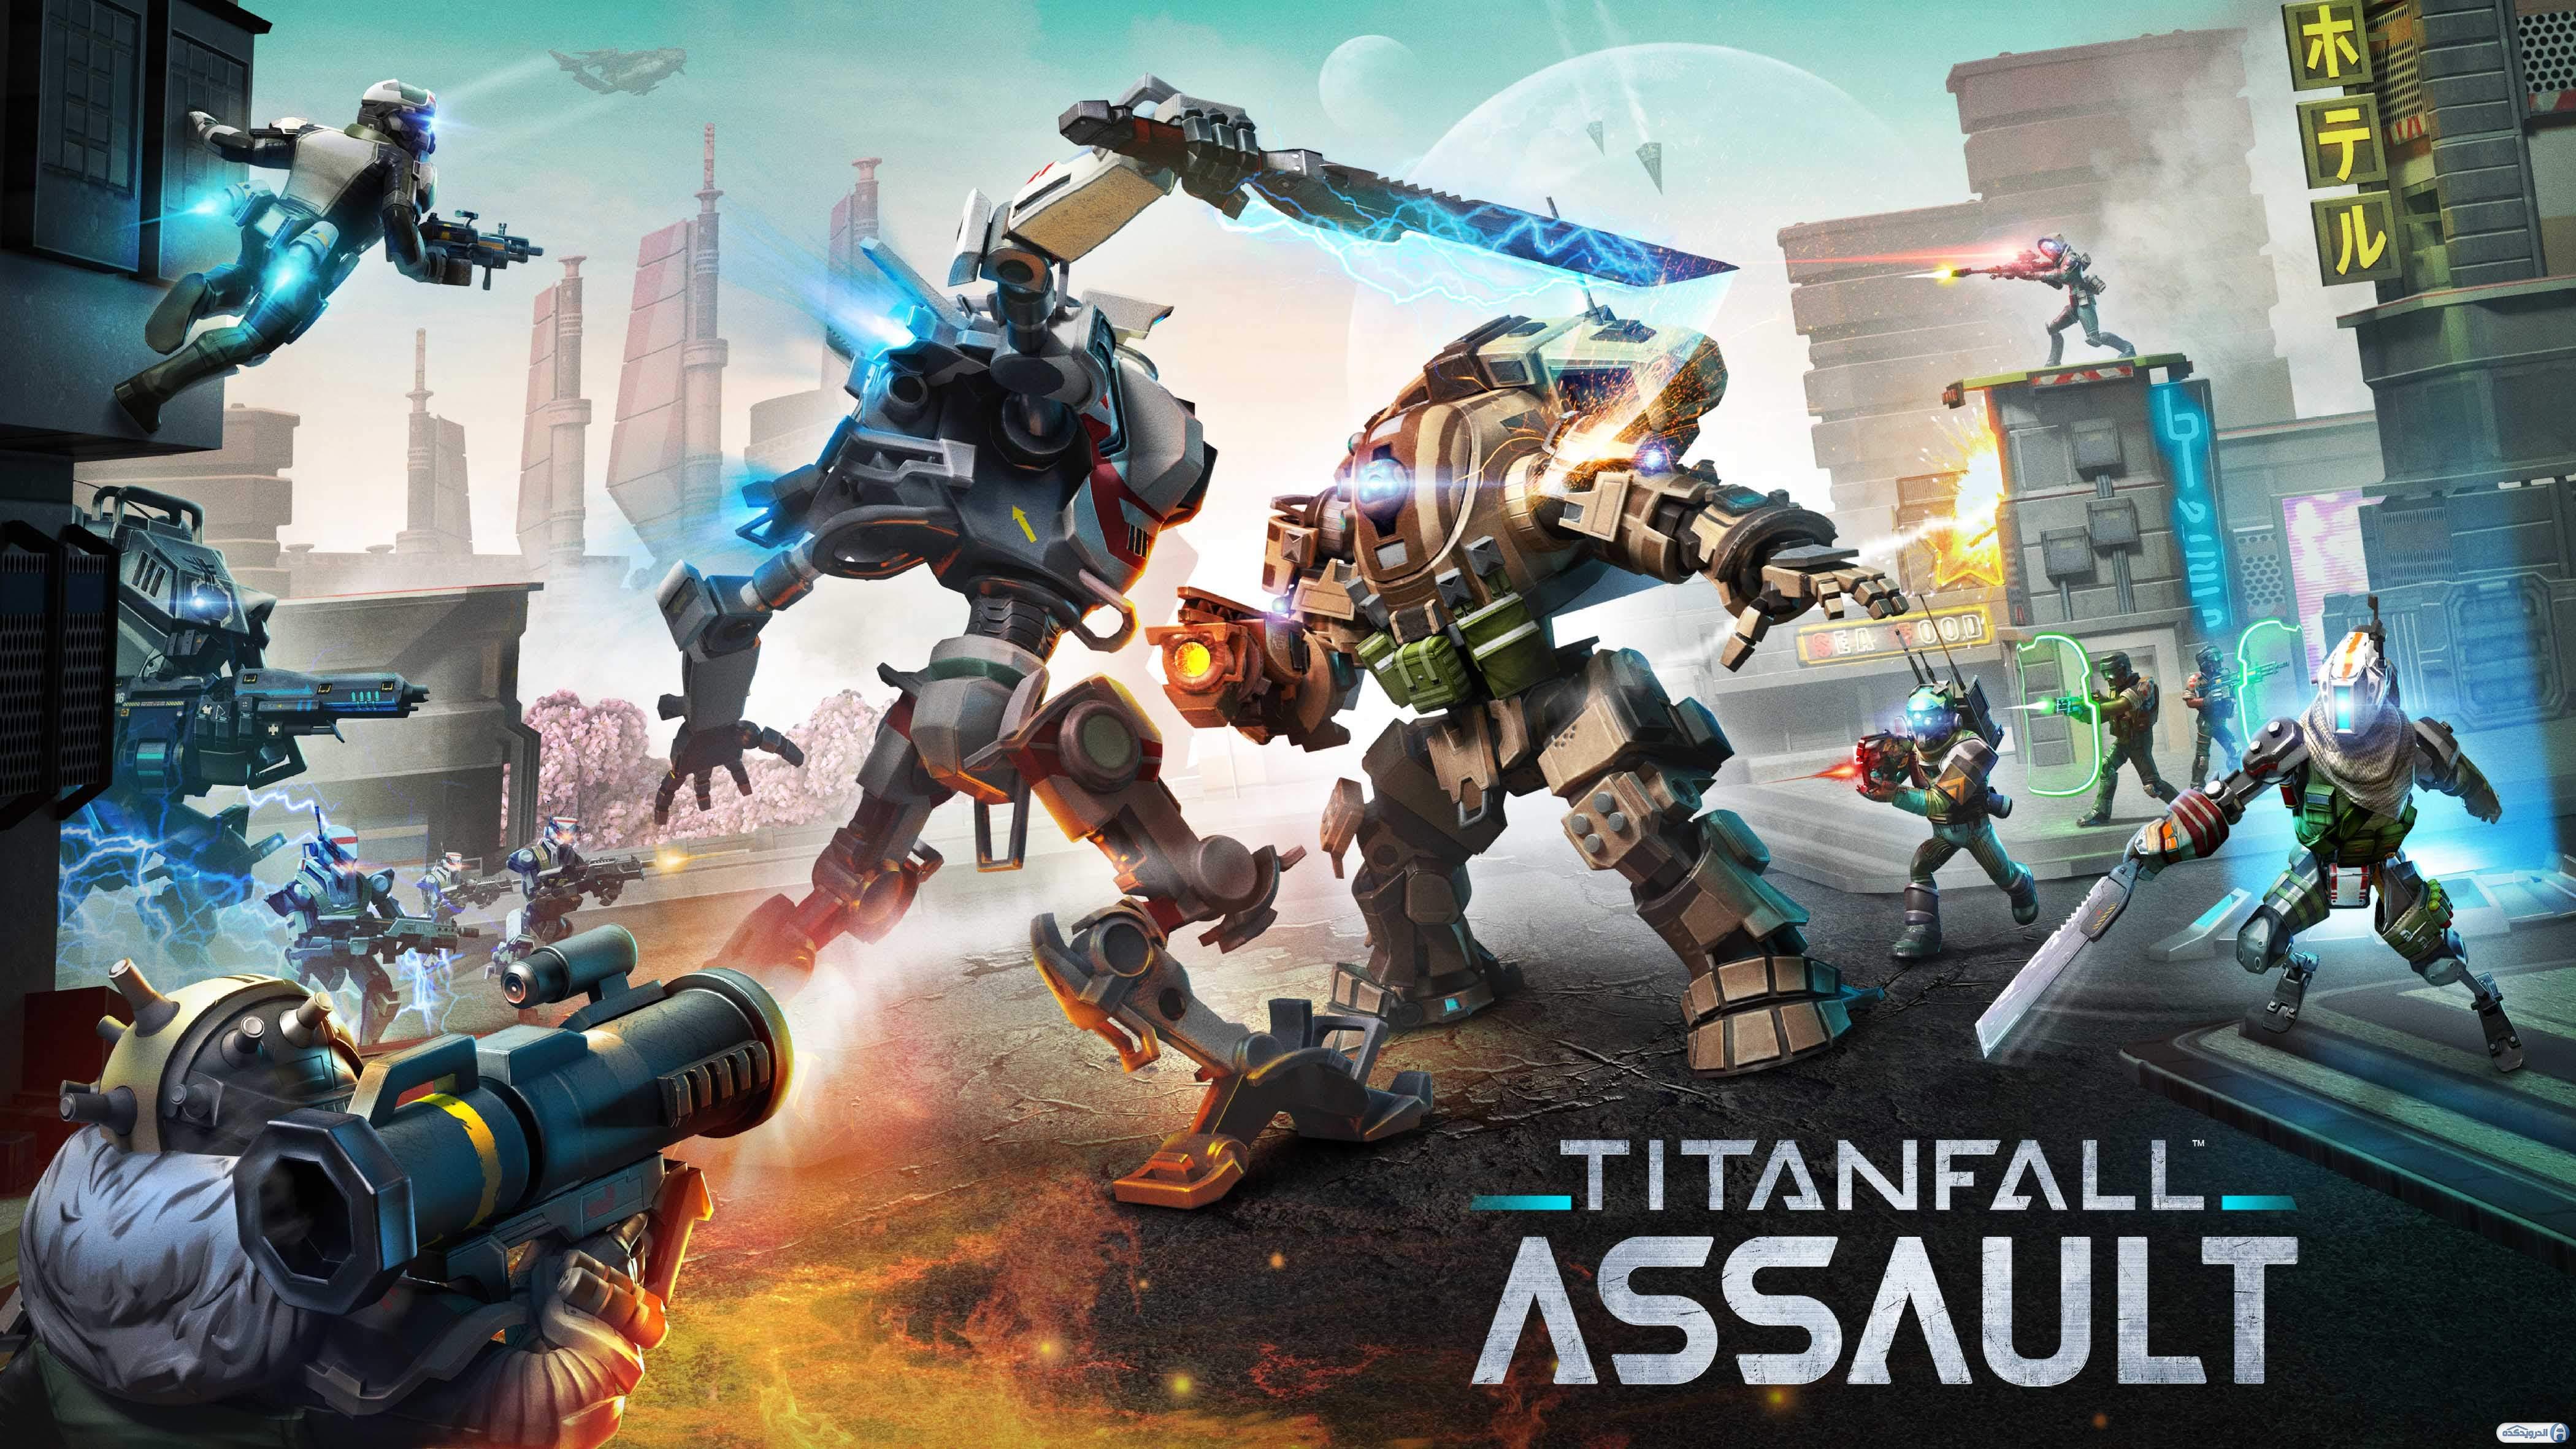 Titanfall-Assault-game